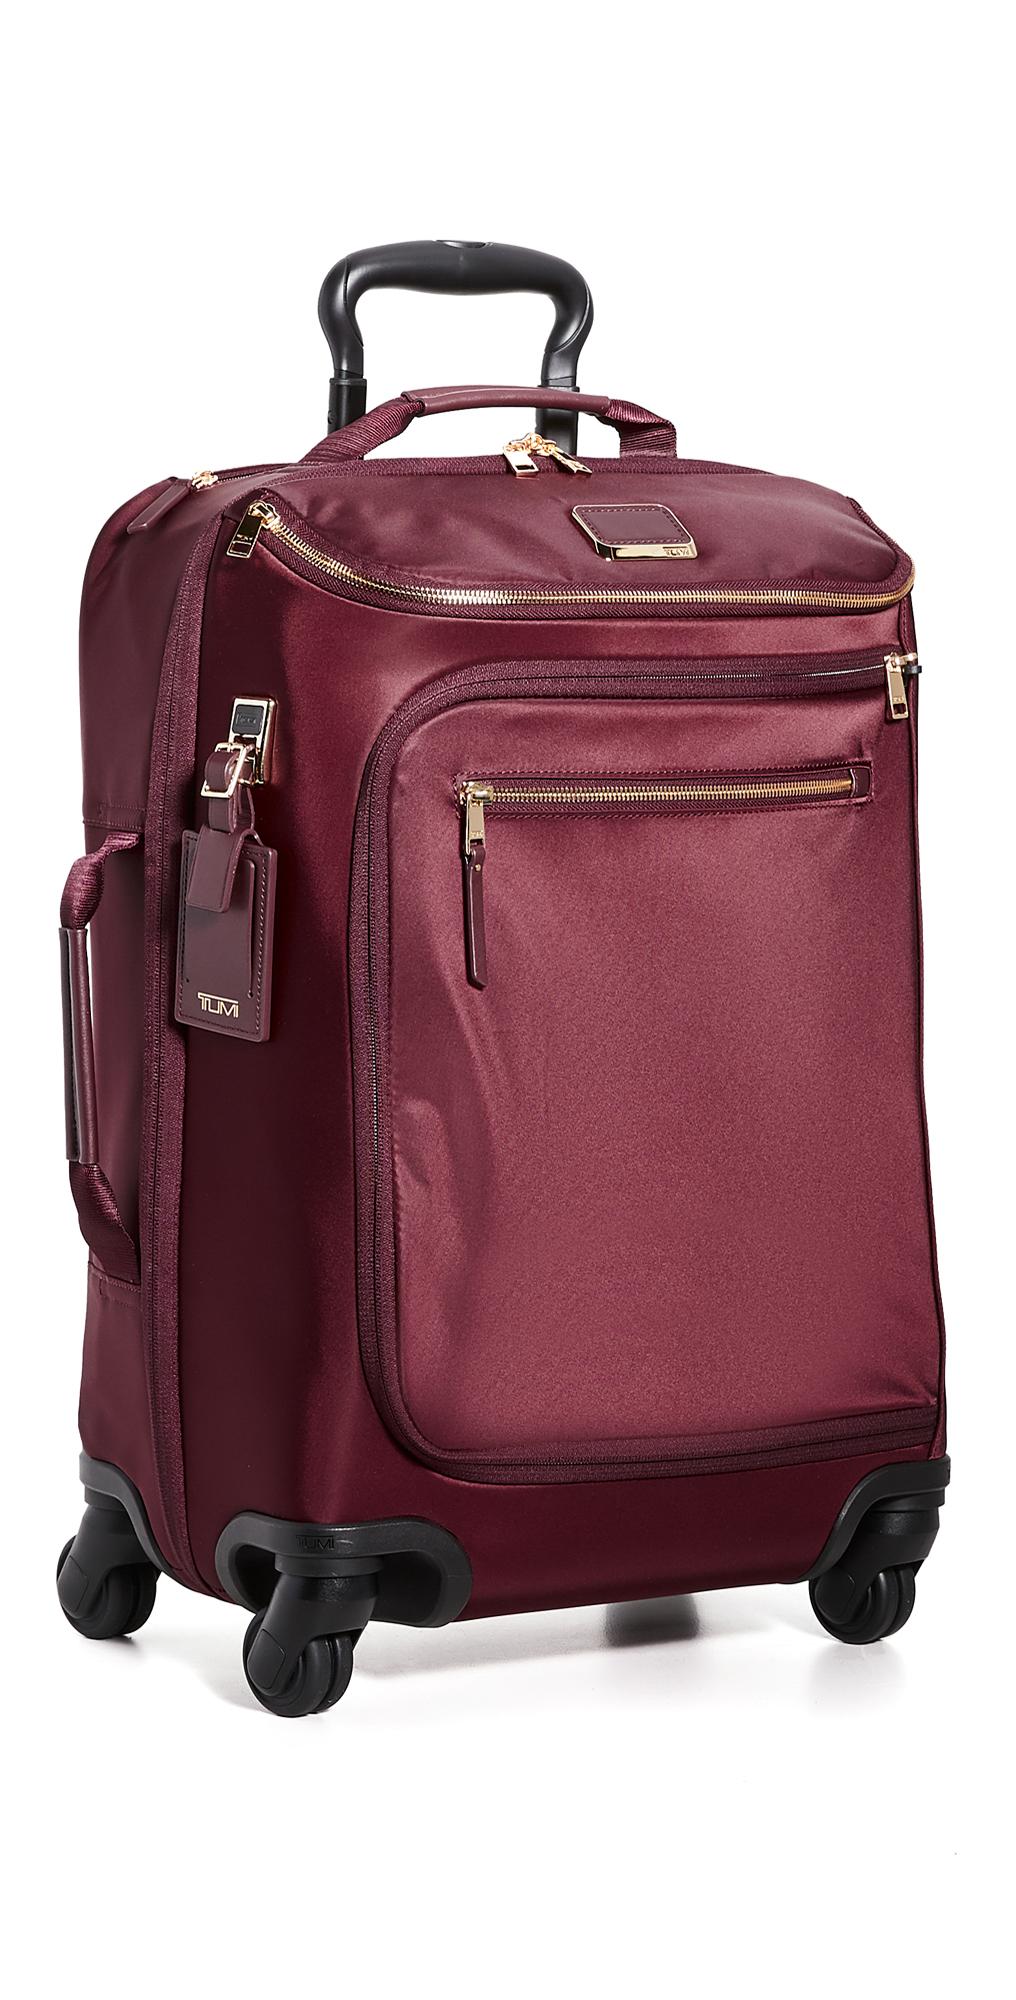 Tumi Leger International Carry On Suitcase